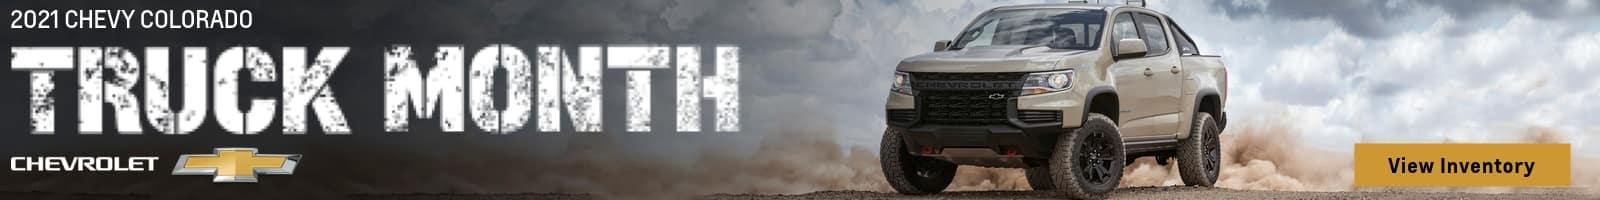 14_2020_NOVEMBER_TRUCK MONTH COLORADO_NATIONAL_1600x200 BANNER